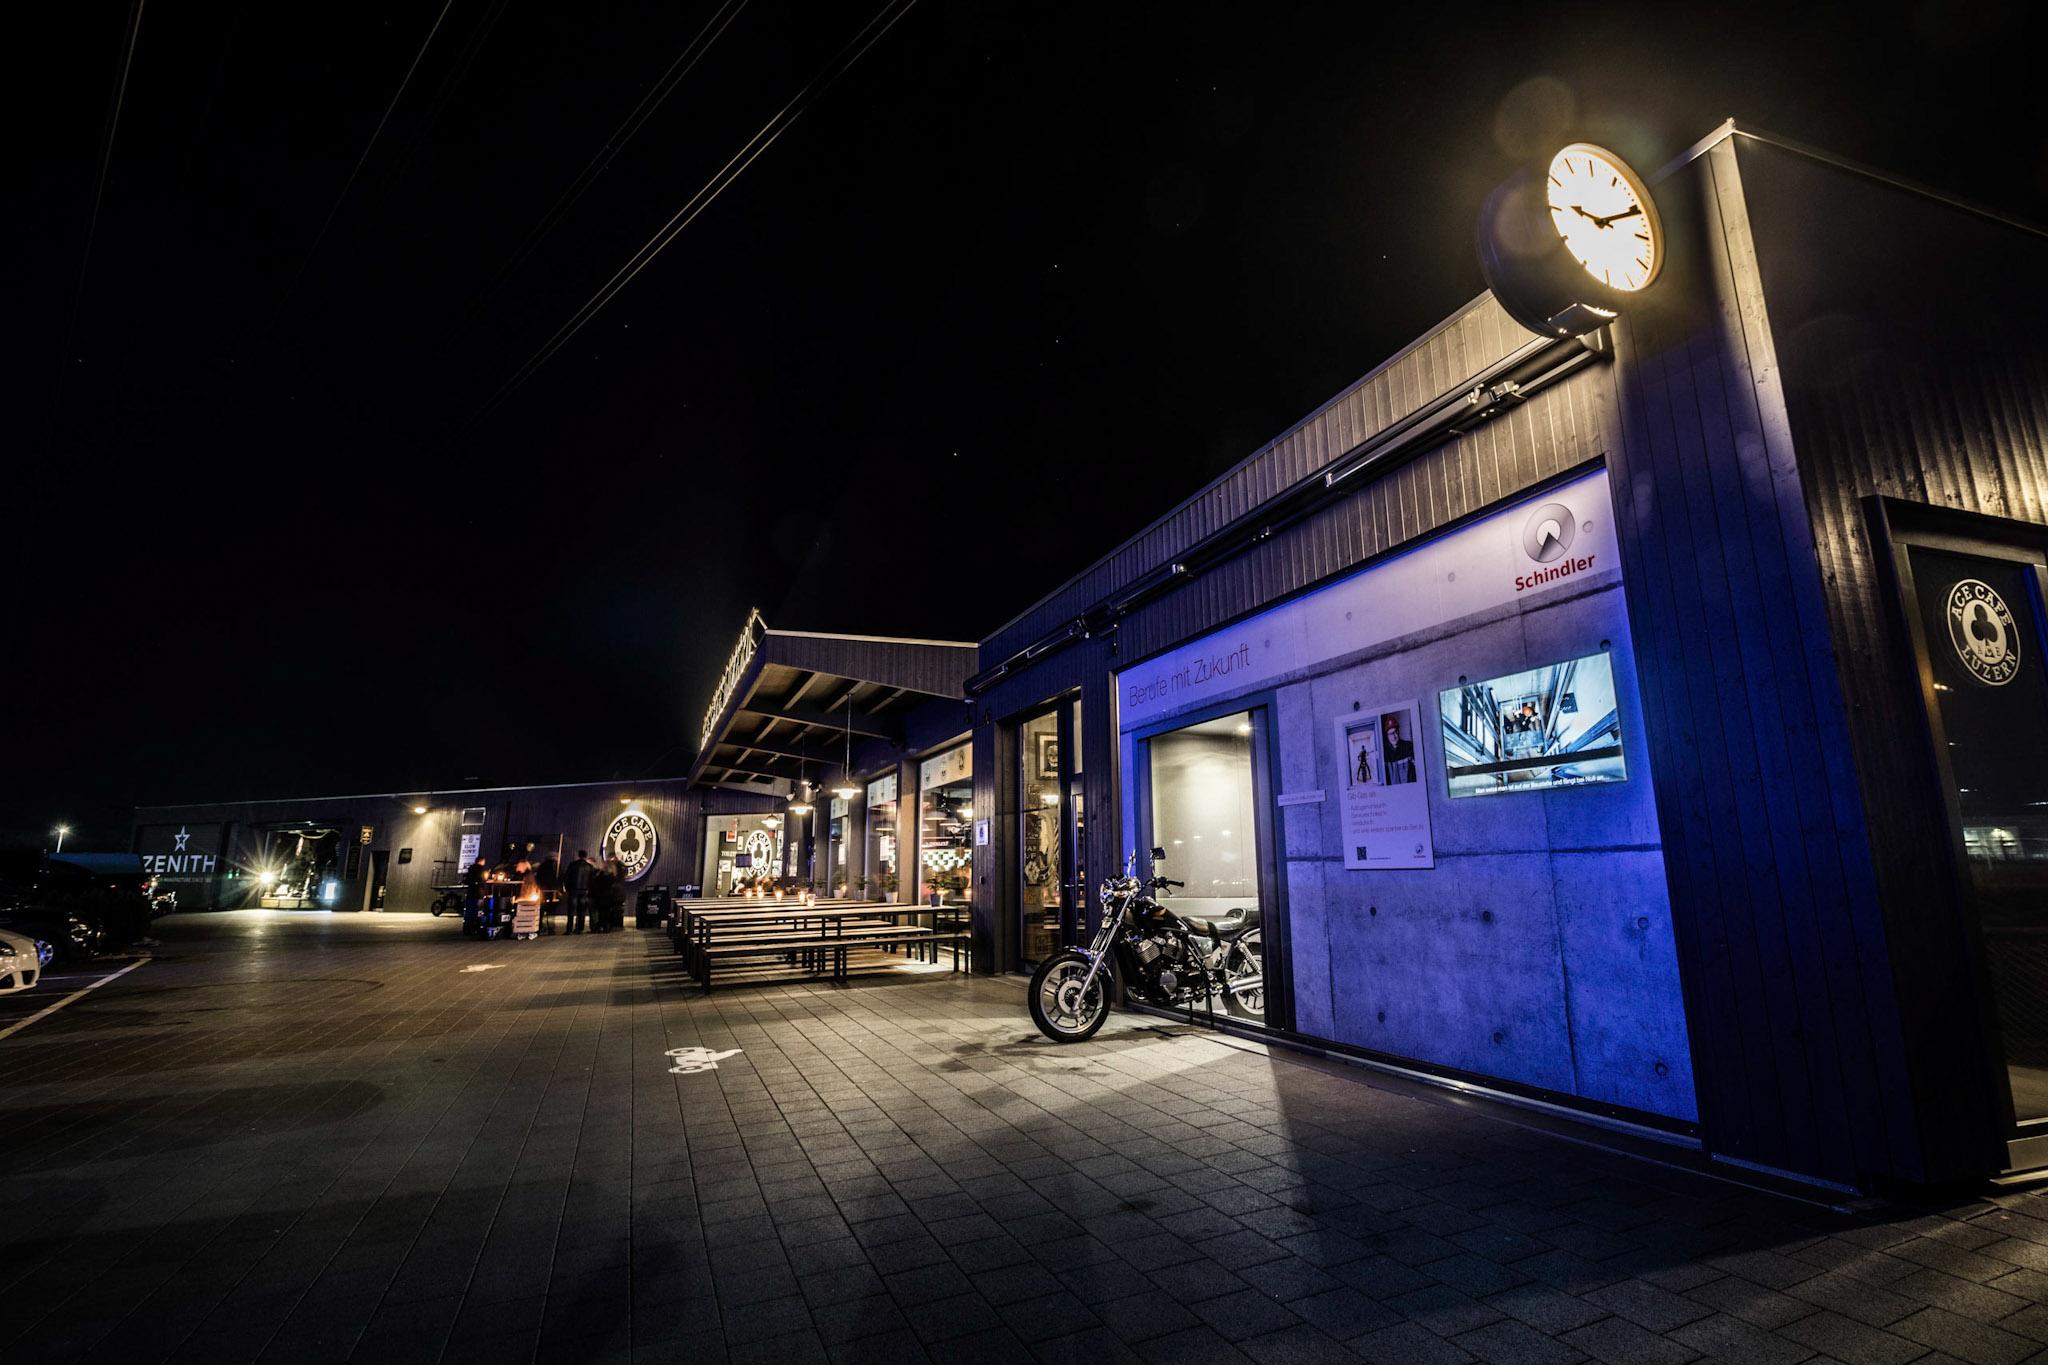 PENGland Schindler Ace Cafe 1.jpg